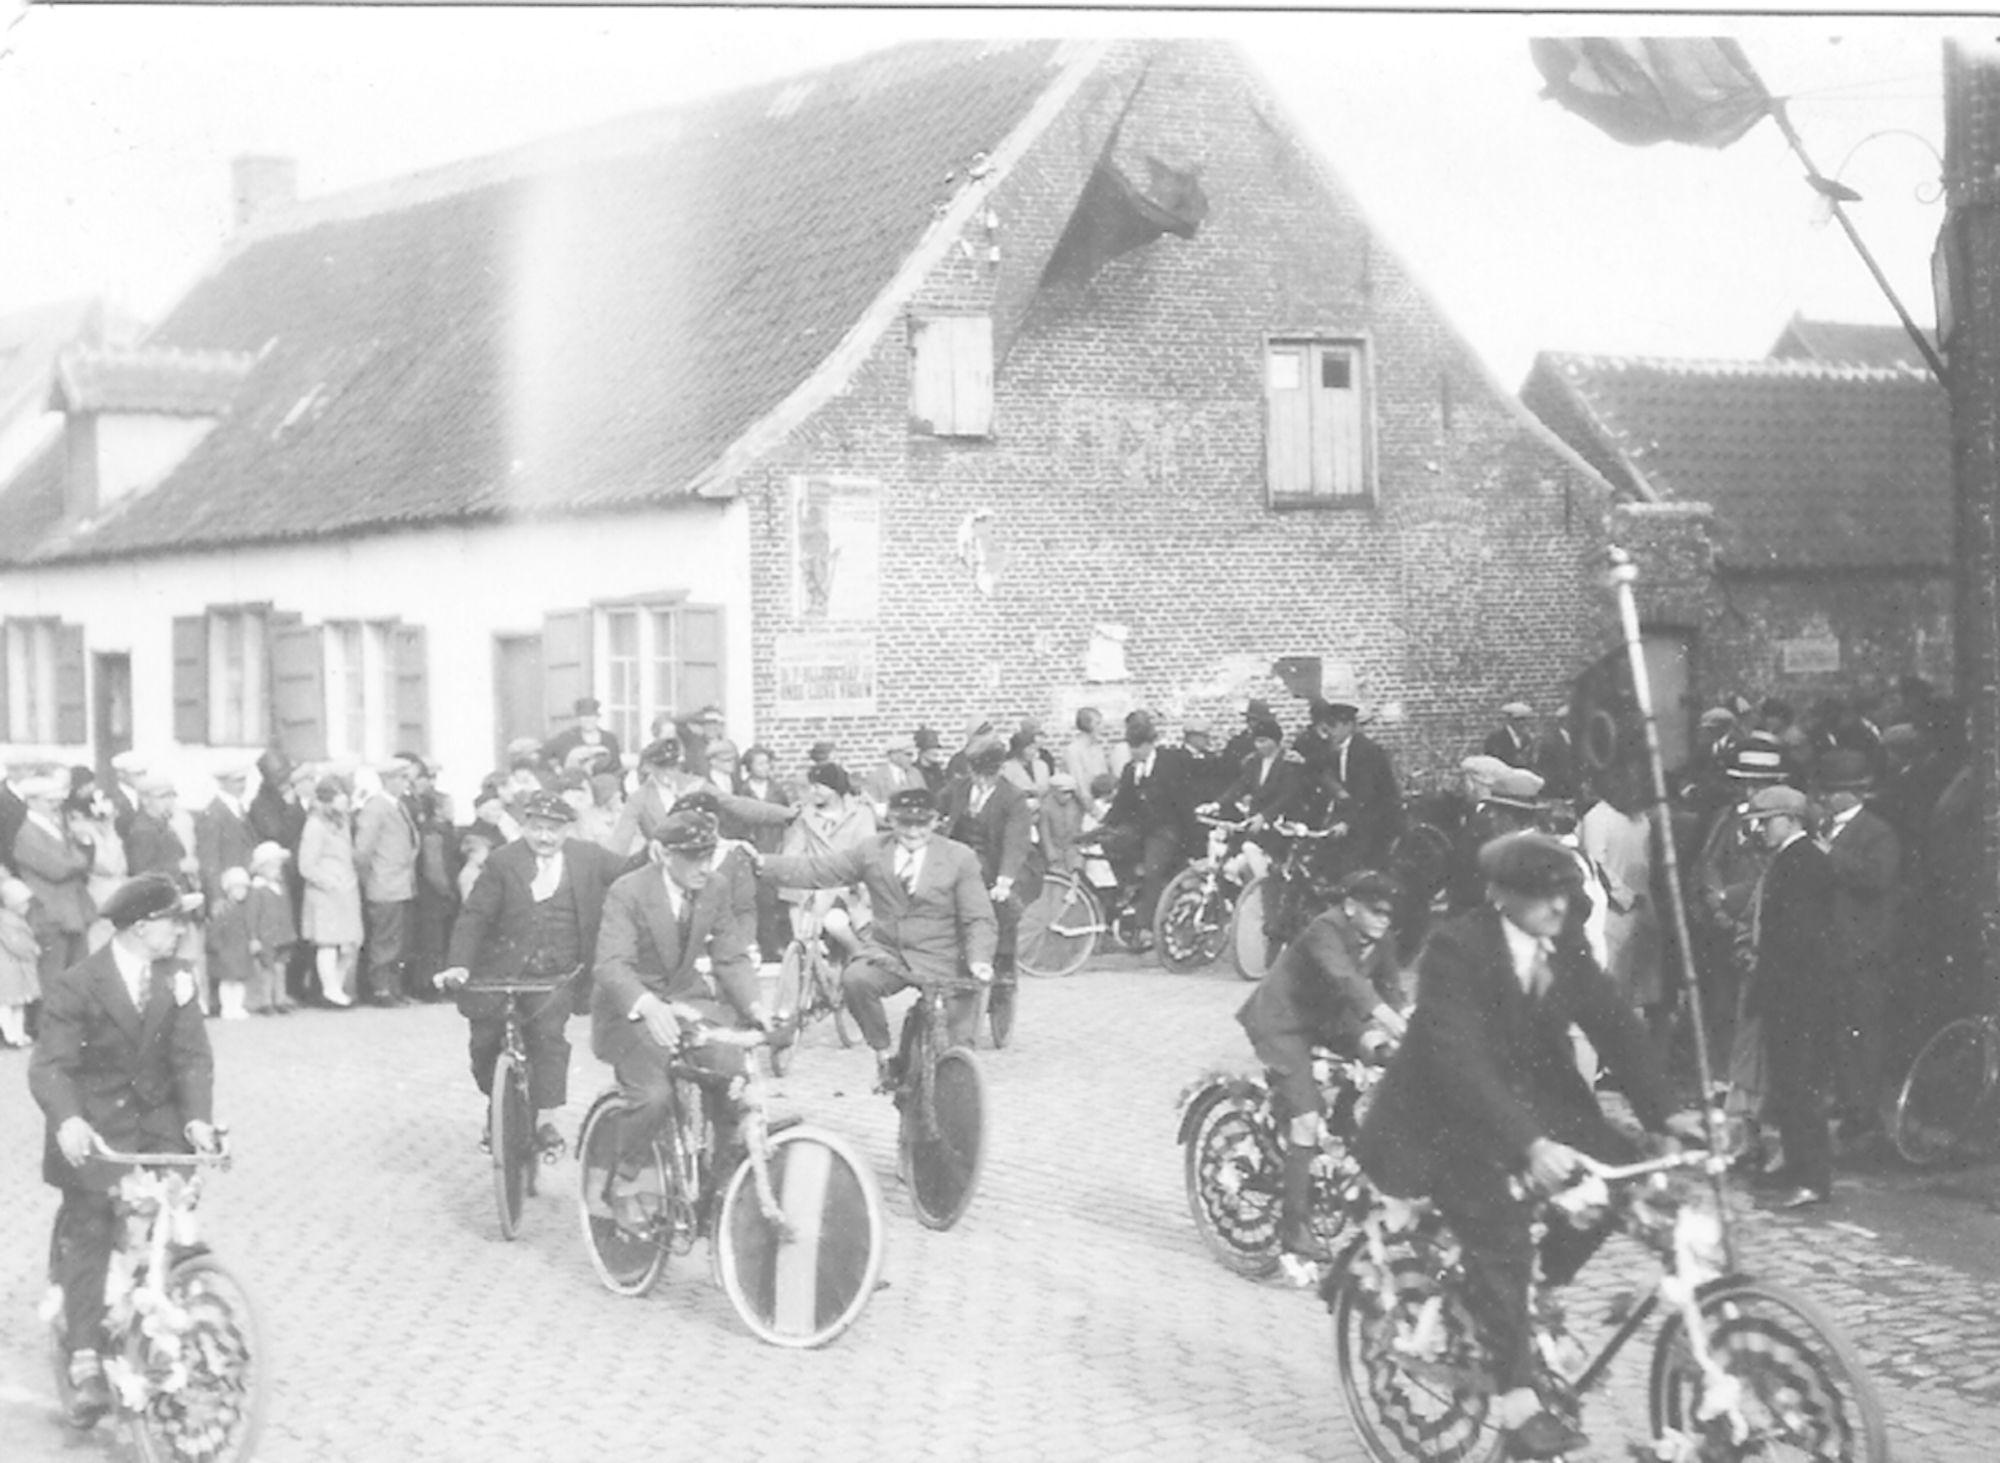 Viering 100 jaar België in Marke